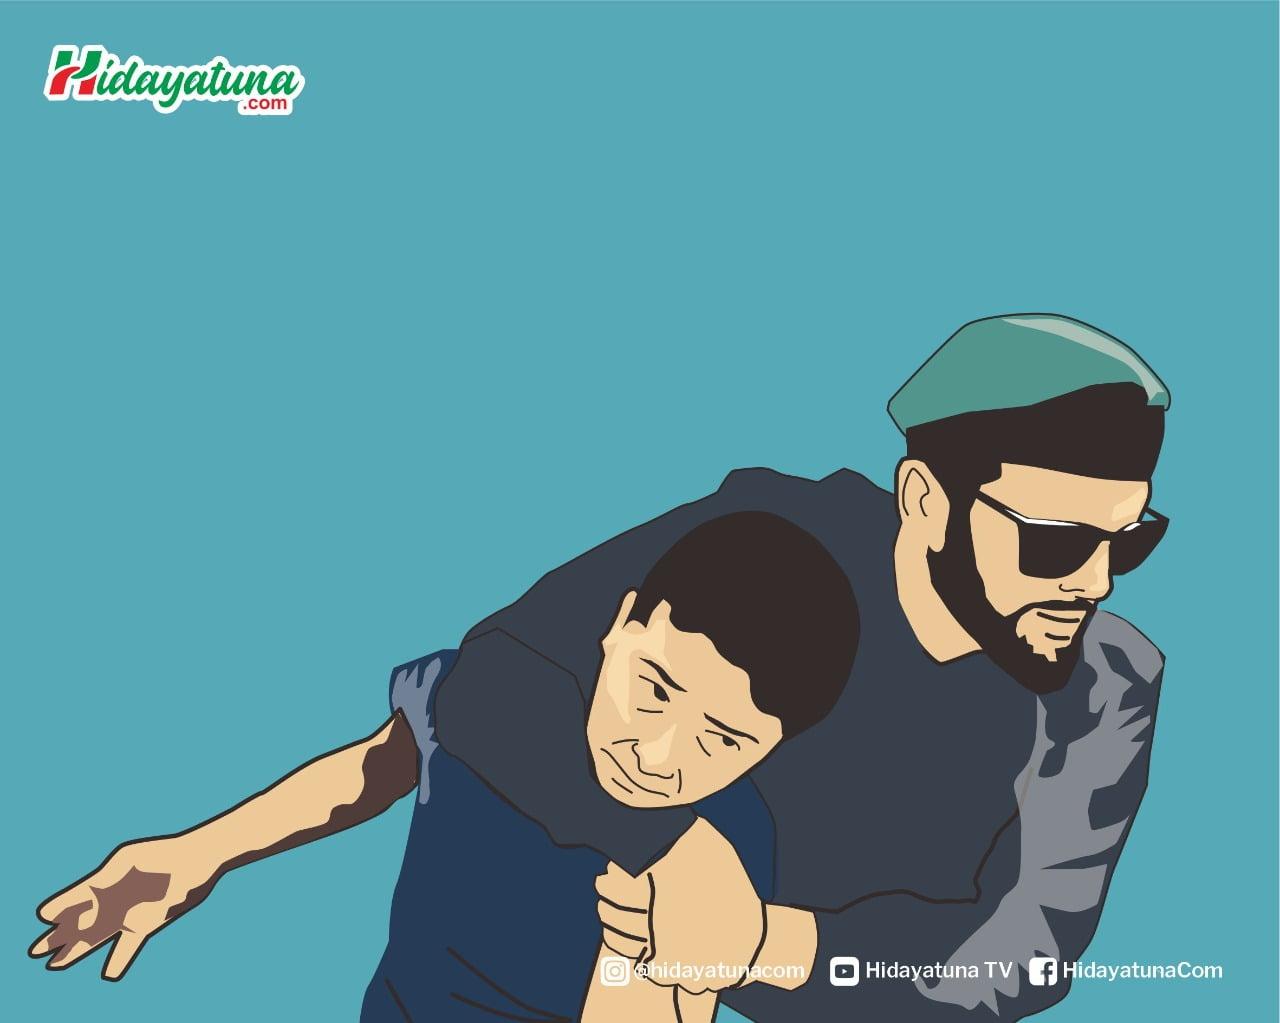 Anak Palestina Ditangkap Israel (Ilustrasi/Hidayatuna)